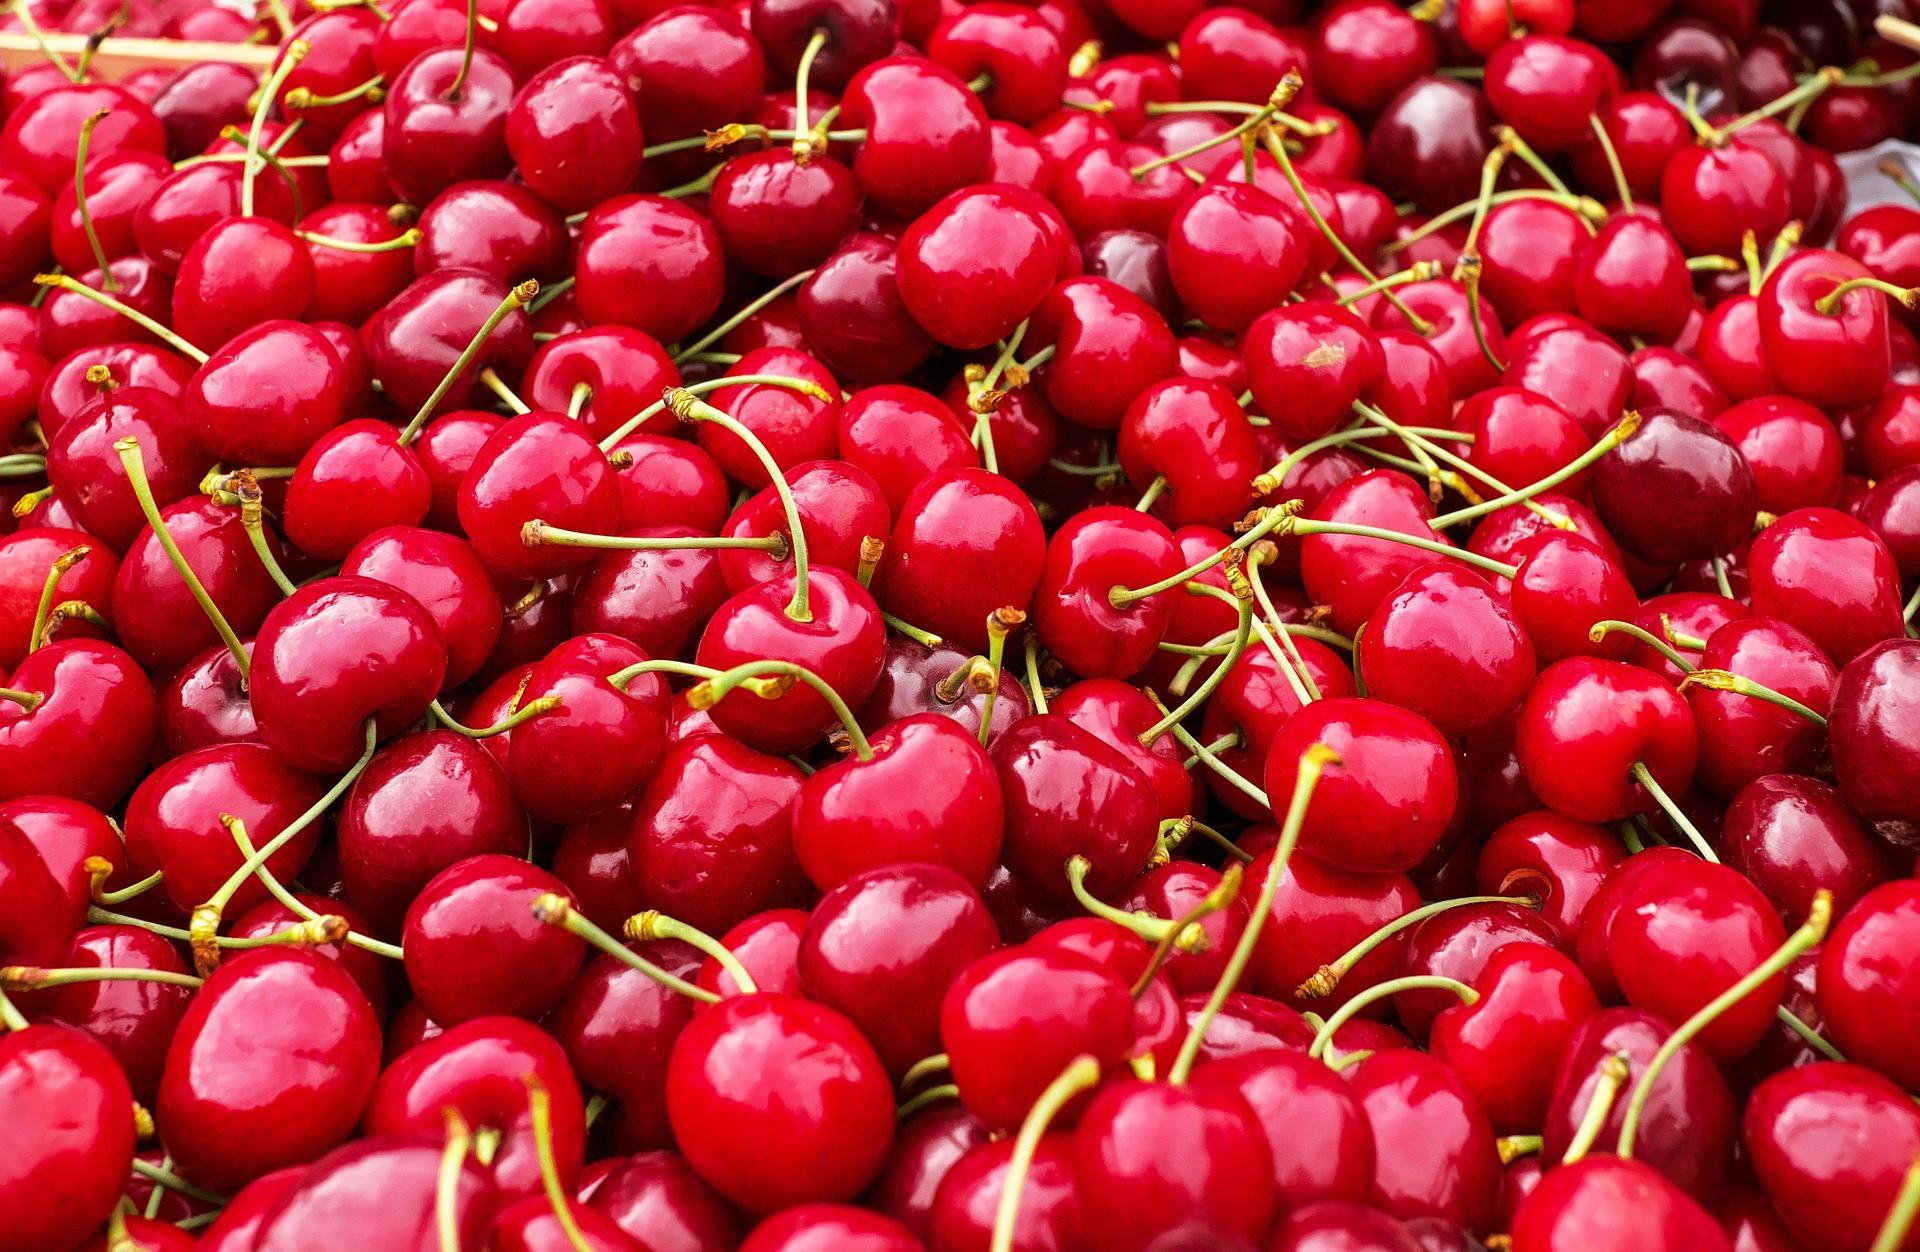 cherries-1465801_1920.jpg